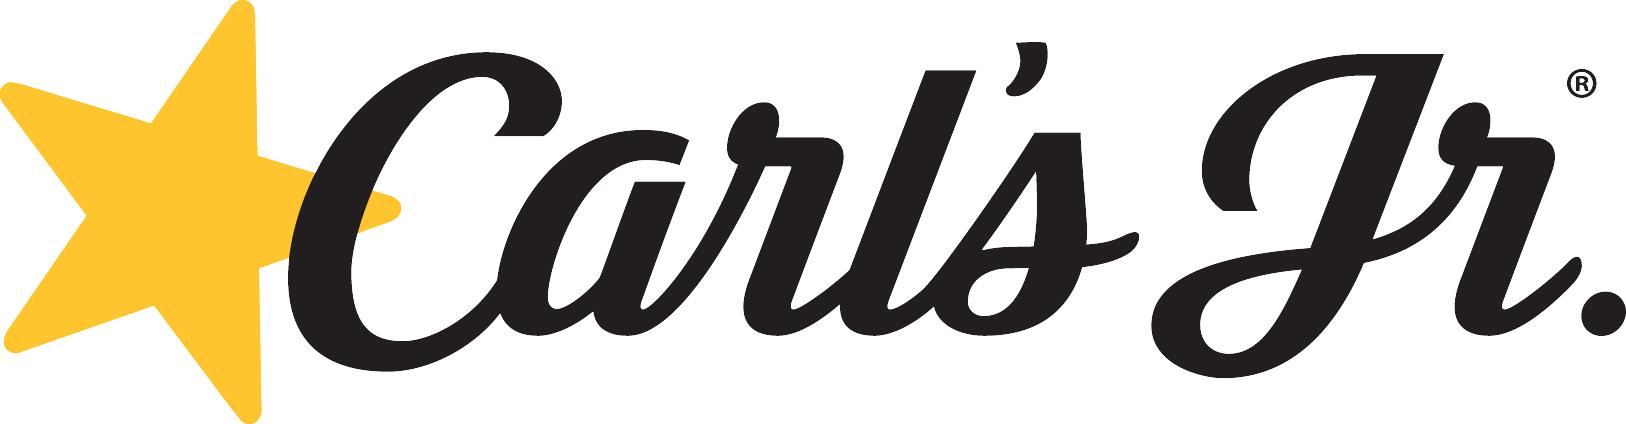 carl's jr. ditches its models in massive rebranding overhaul